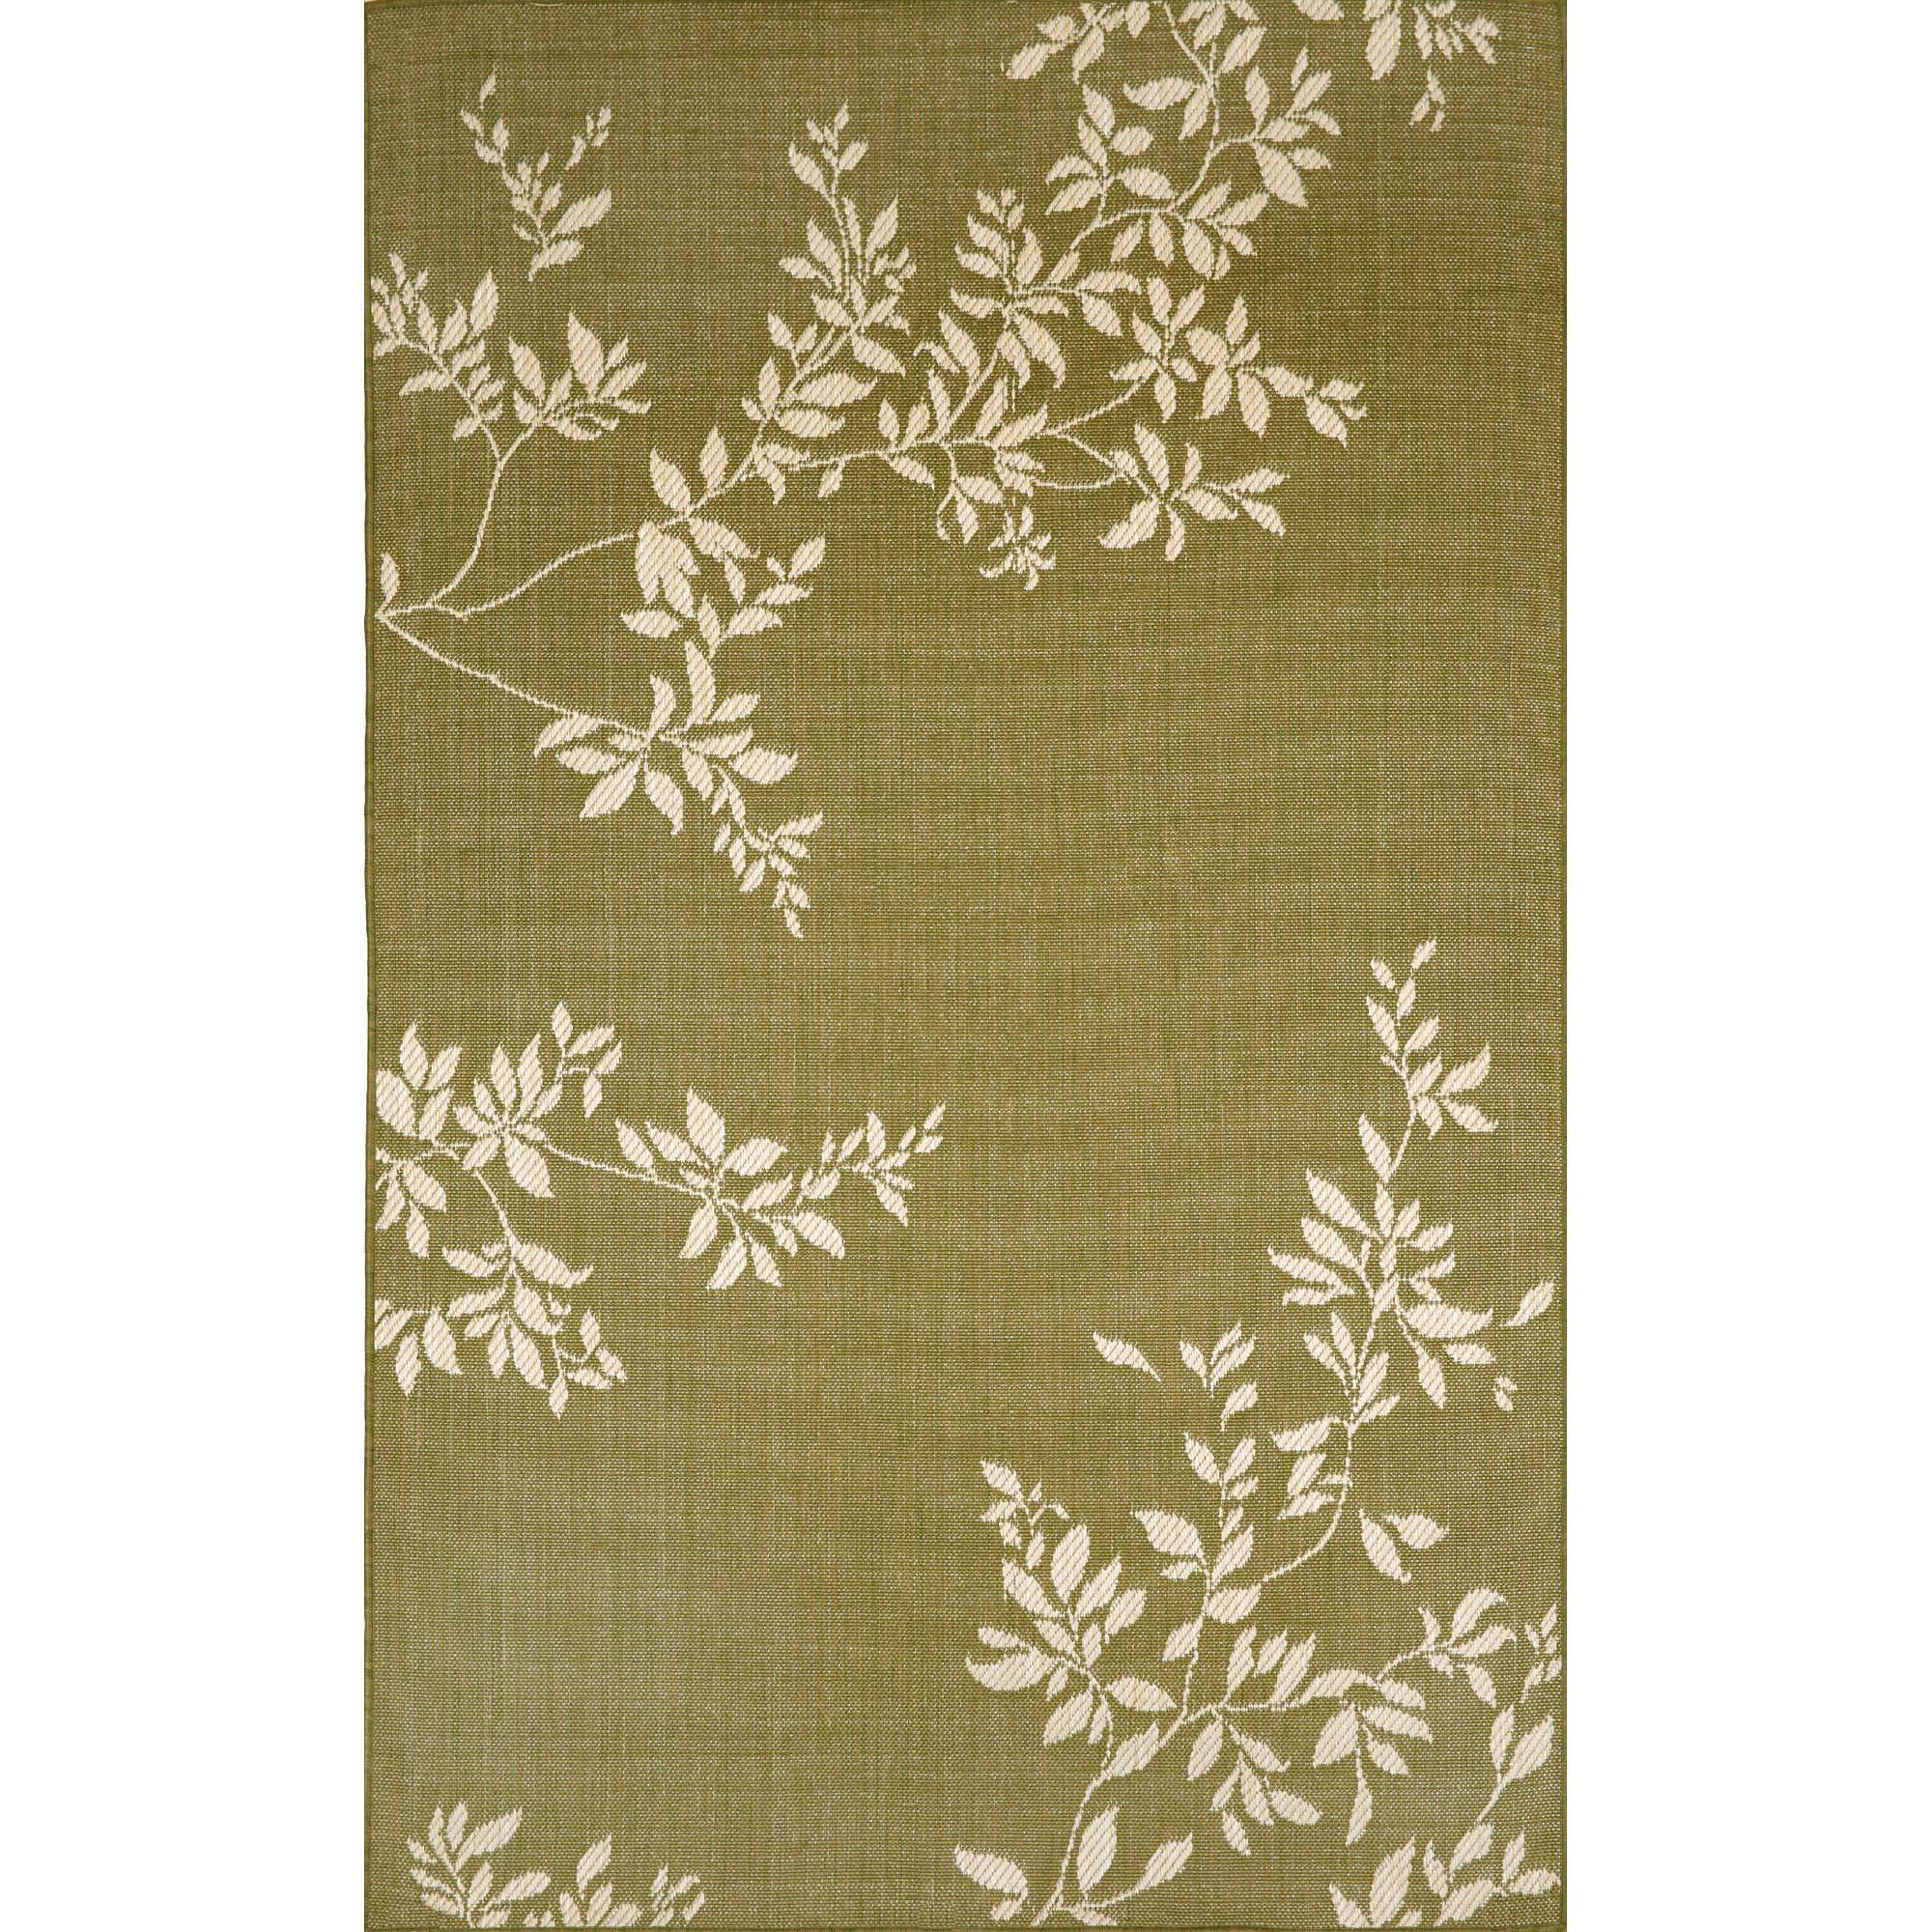 Liora Manne Terrace Vine Rug, Indoor/Outdoor, 7-Feet 10-Inch by 9-Feet 10-Inch, Green